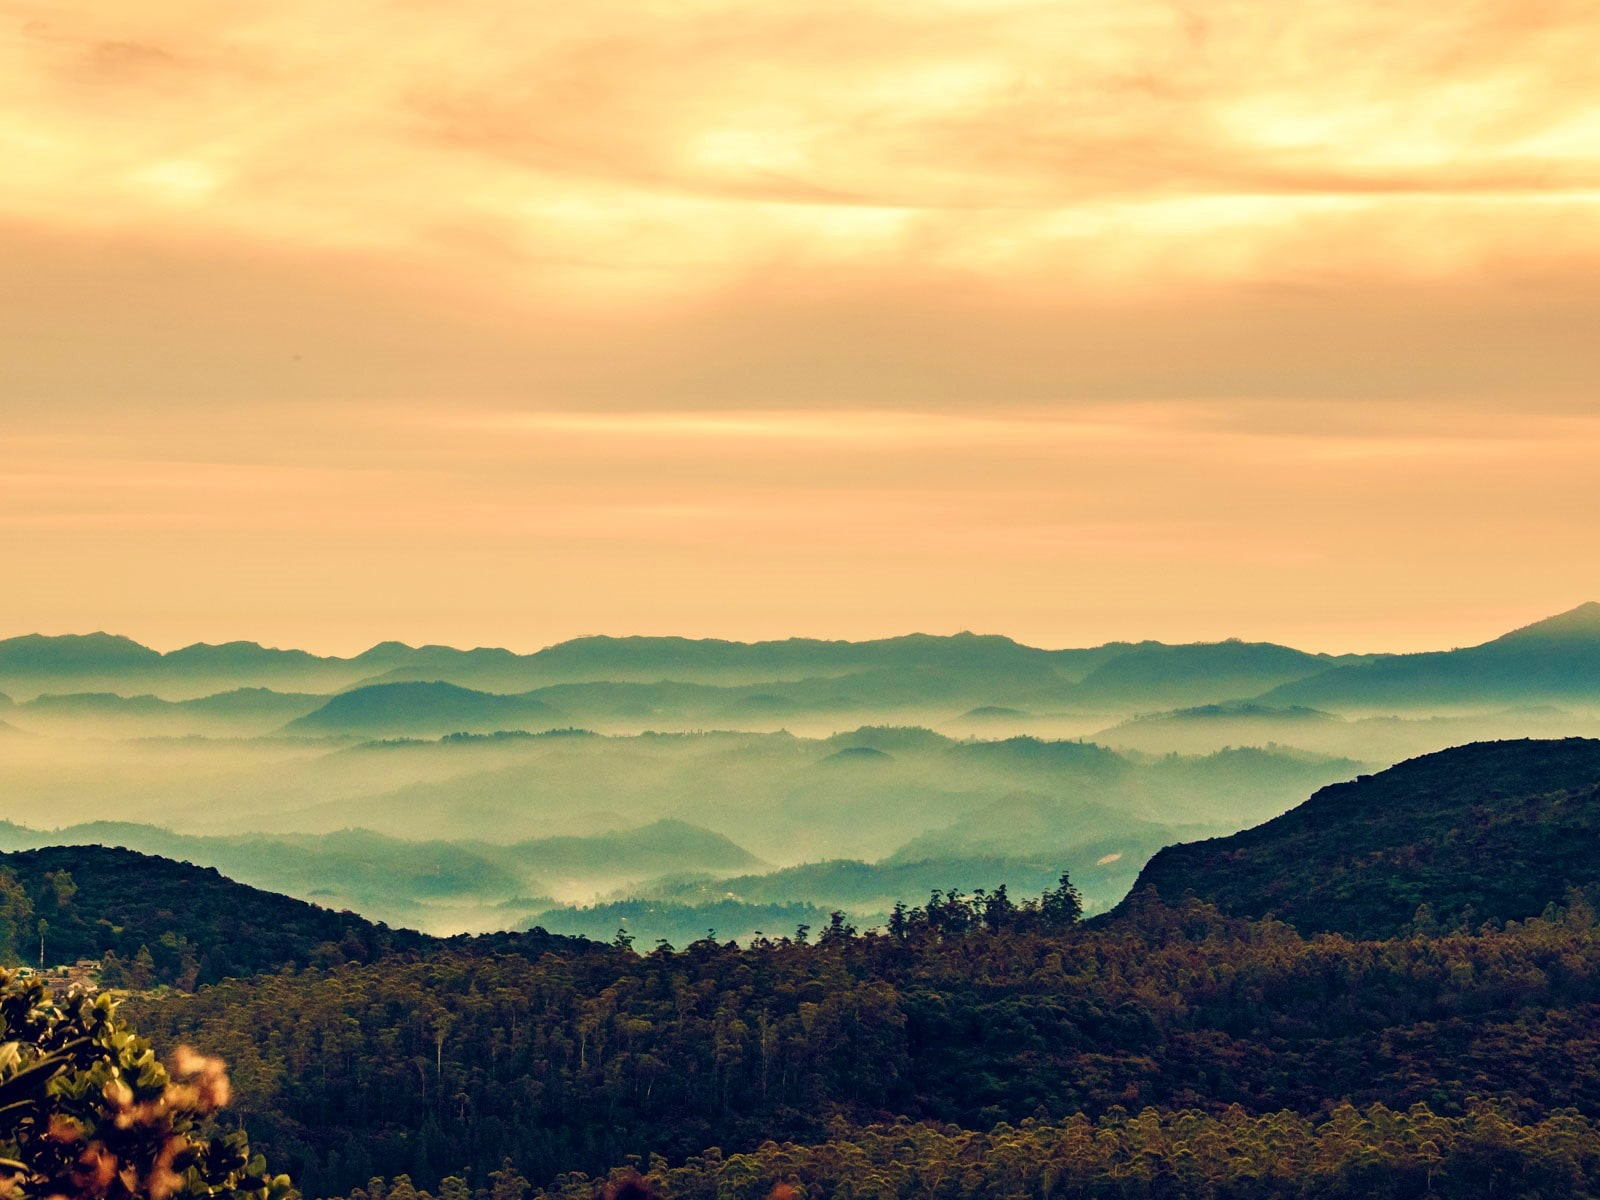 rondreis sri lanka centrale hooglanden blog